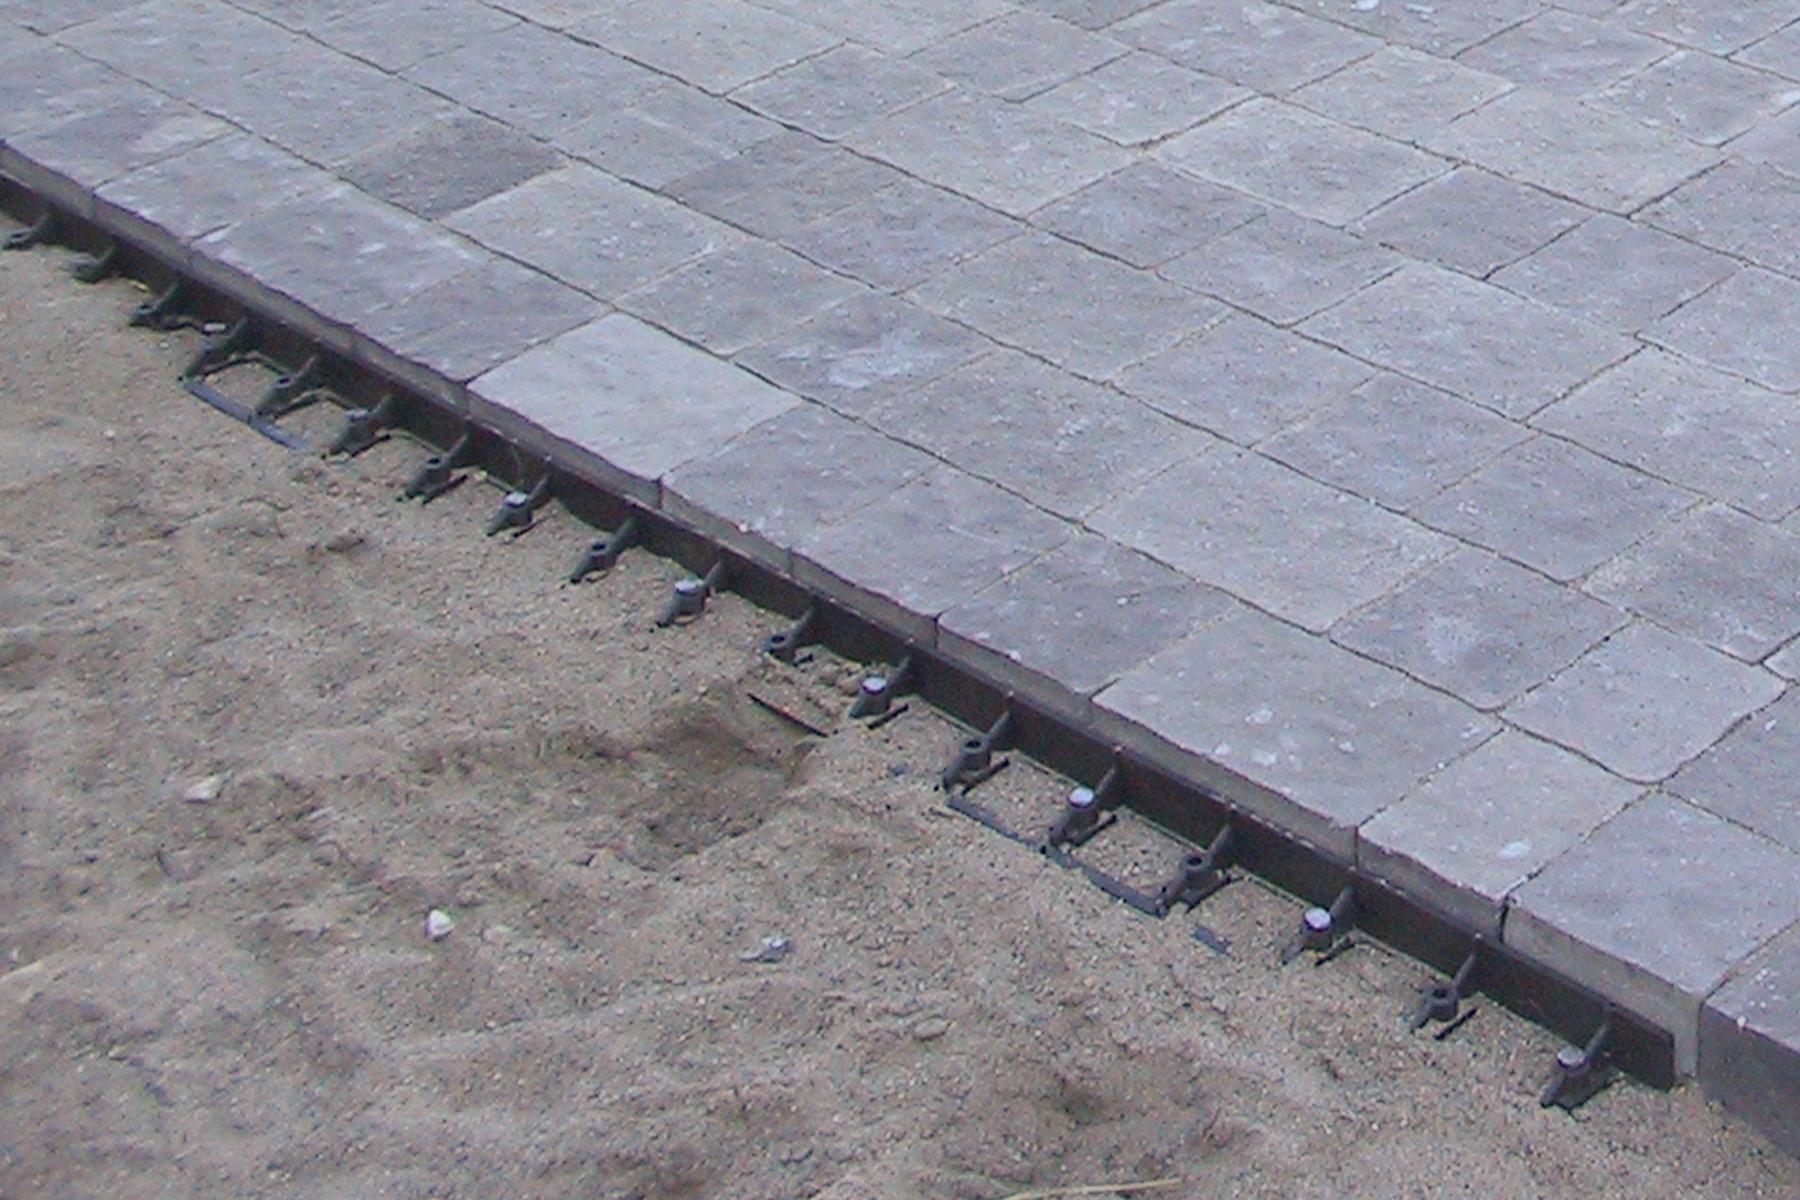 Paving-stone-spikes.jpg